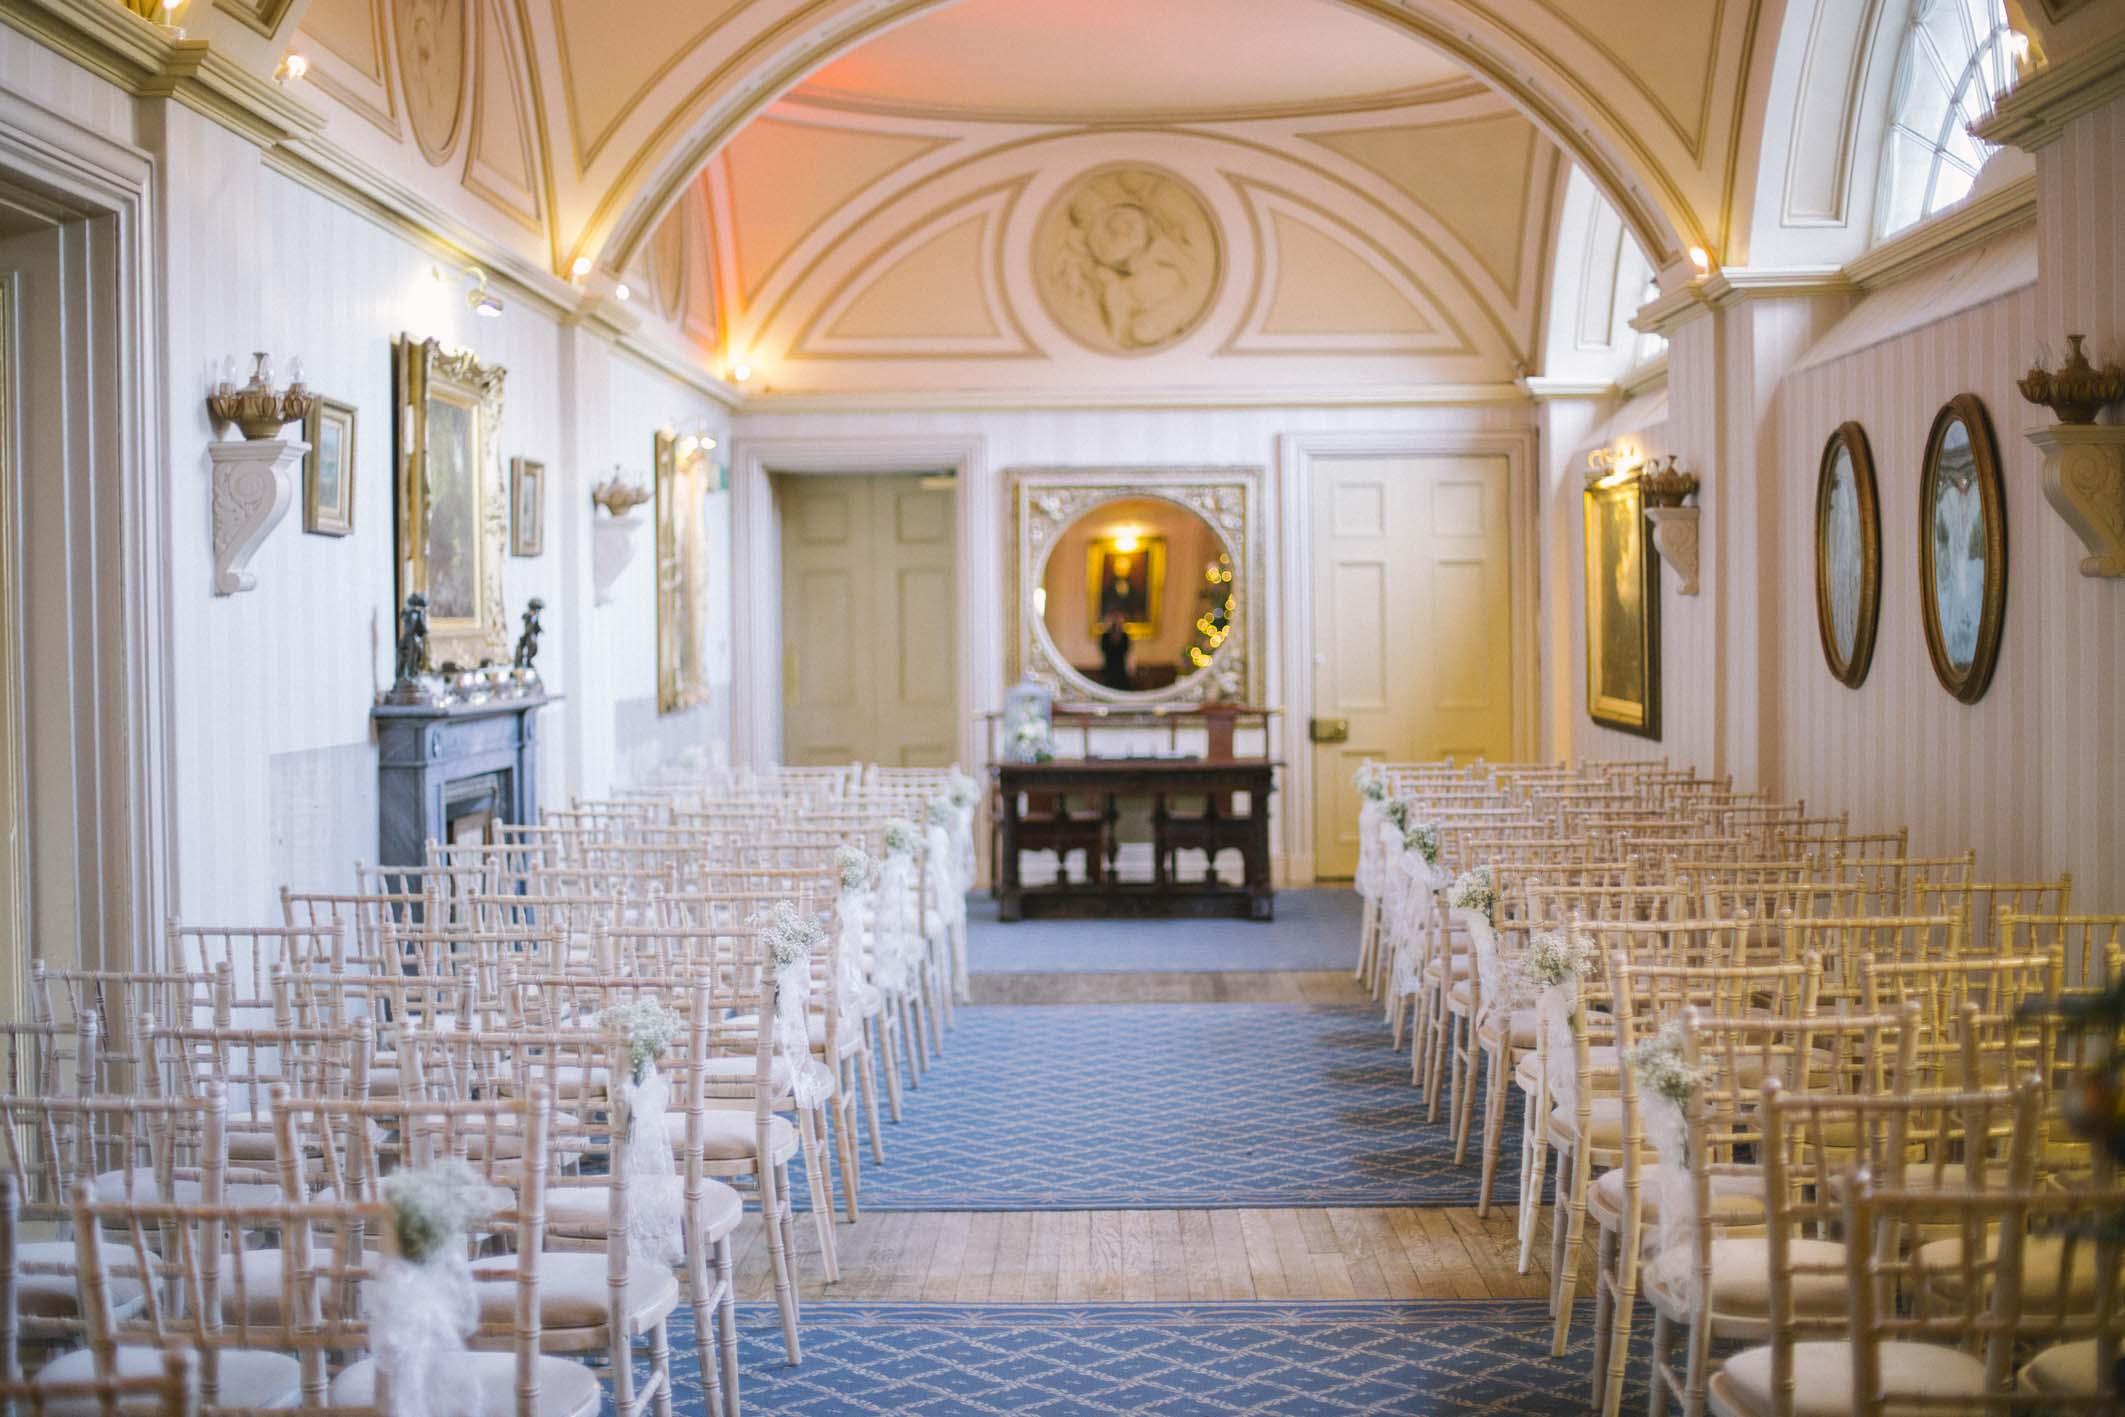 Wedding Ceremony at Long Gallery at Balbirnie House, Fife | Elegant Winter Wedding | Photo by Ceranna Photography